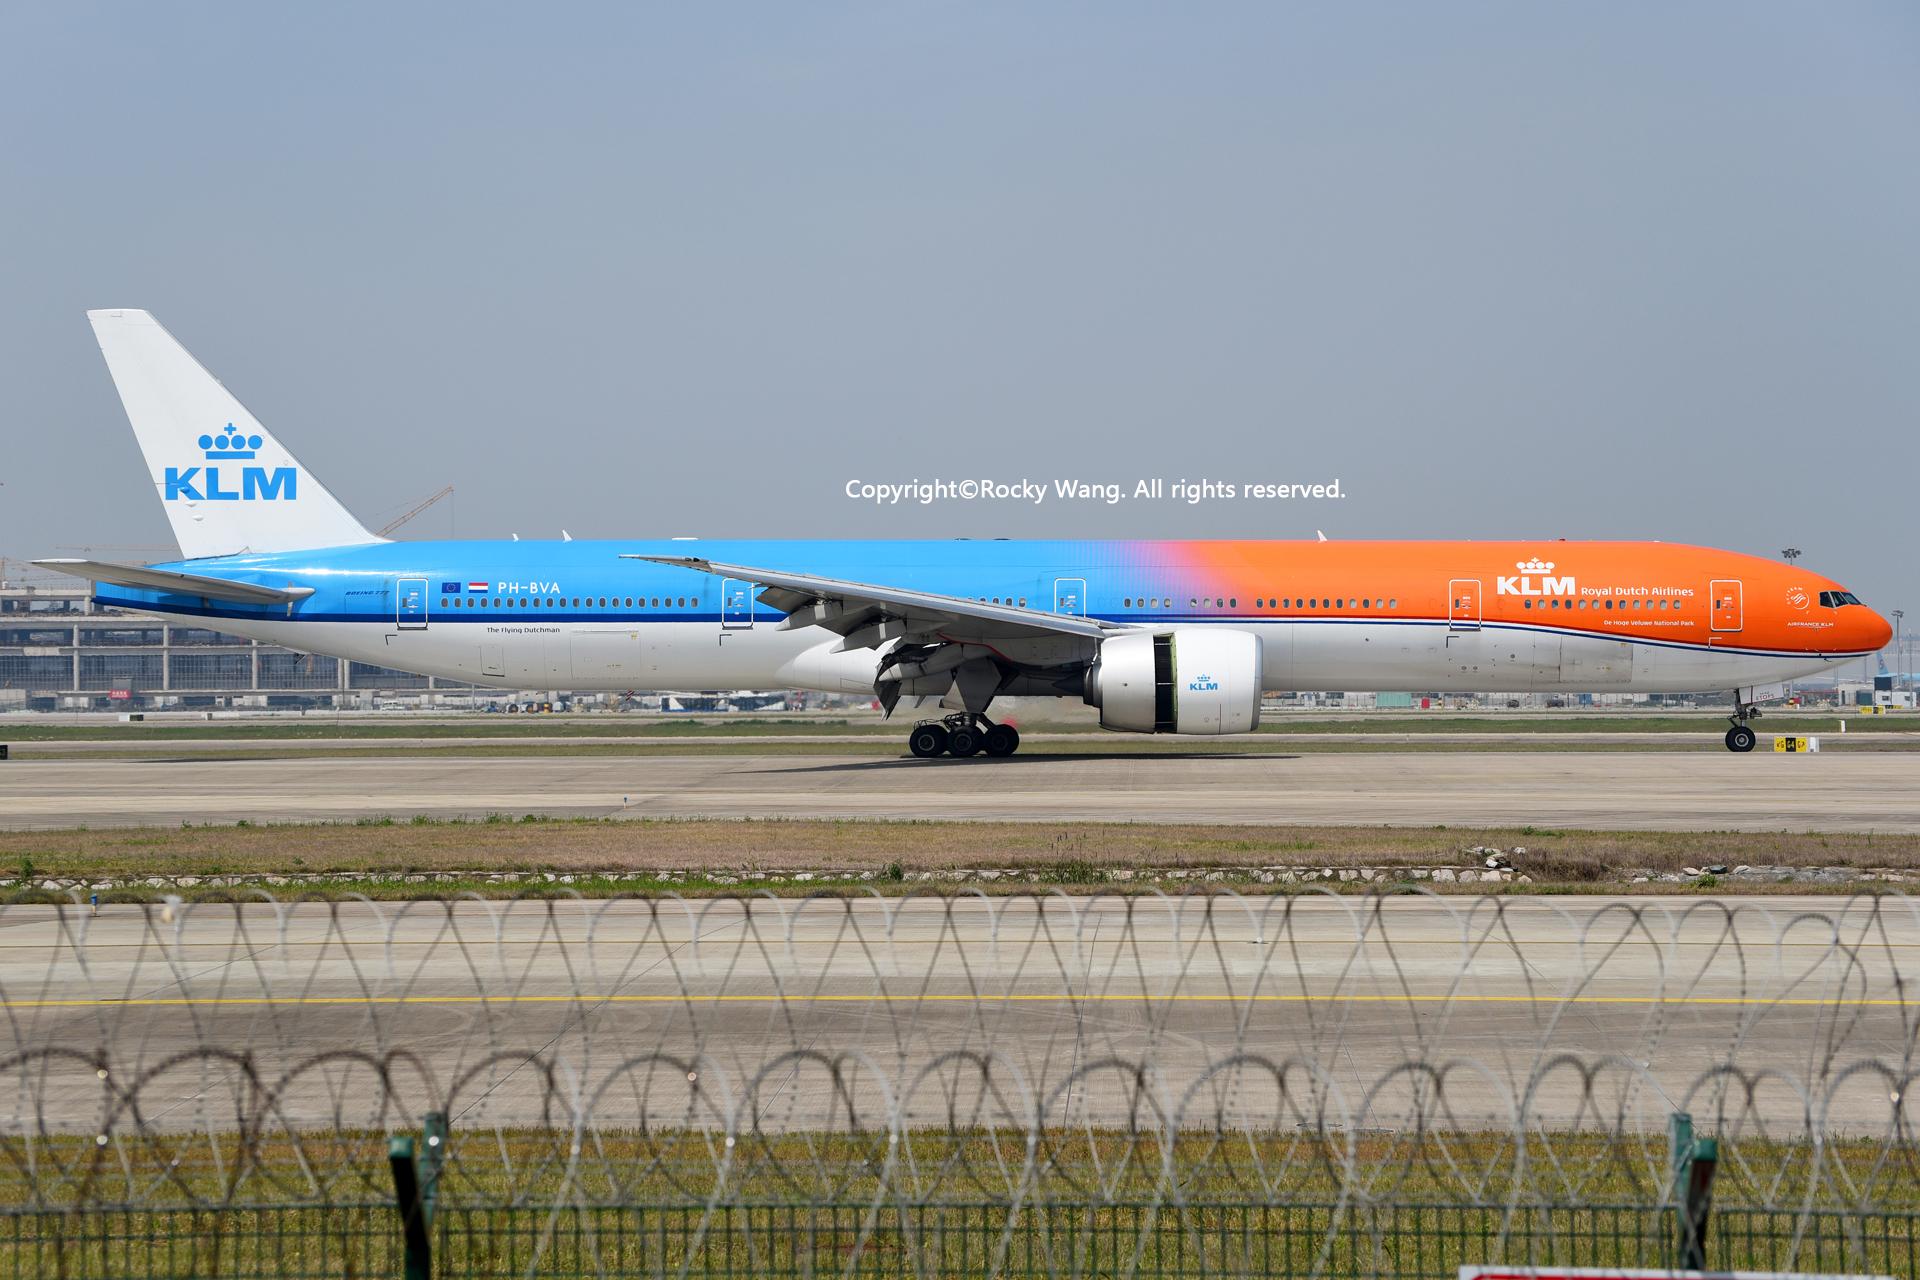 Re:[原创]居家了 批量处理老图 倾情奉献52家777 BOEING 777-306ER PH-BVA Shanghai Pudong